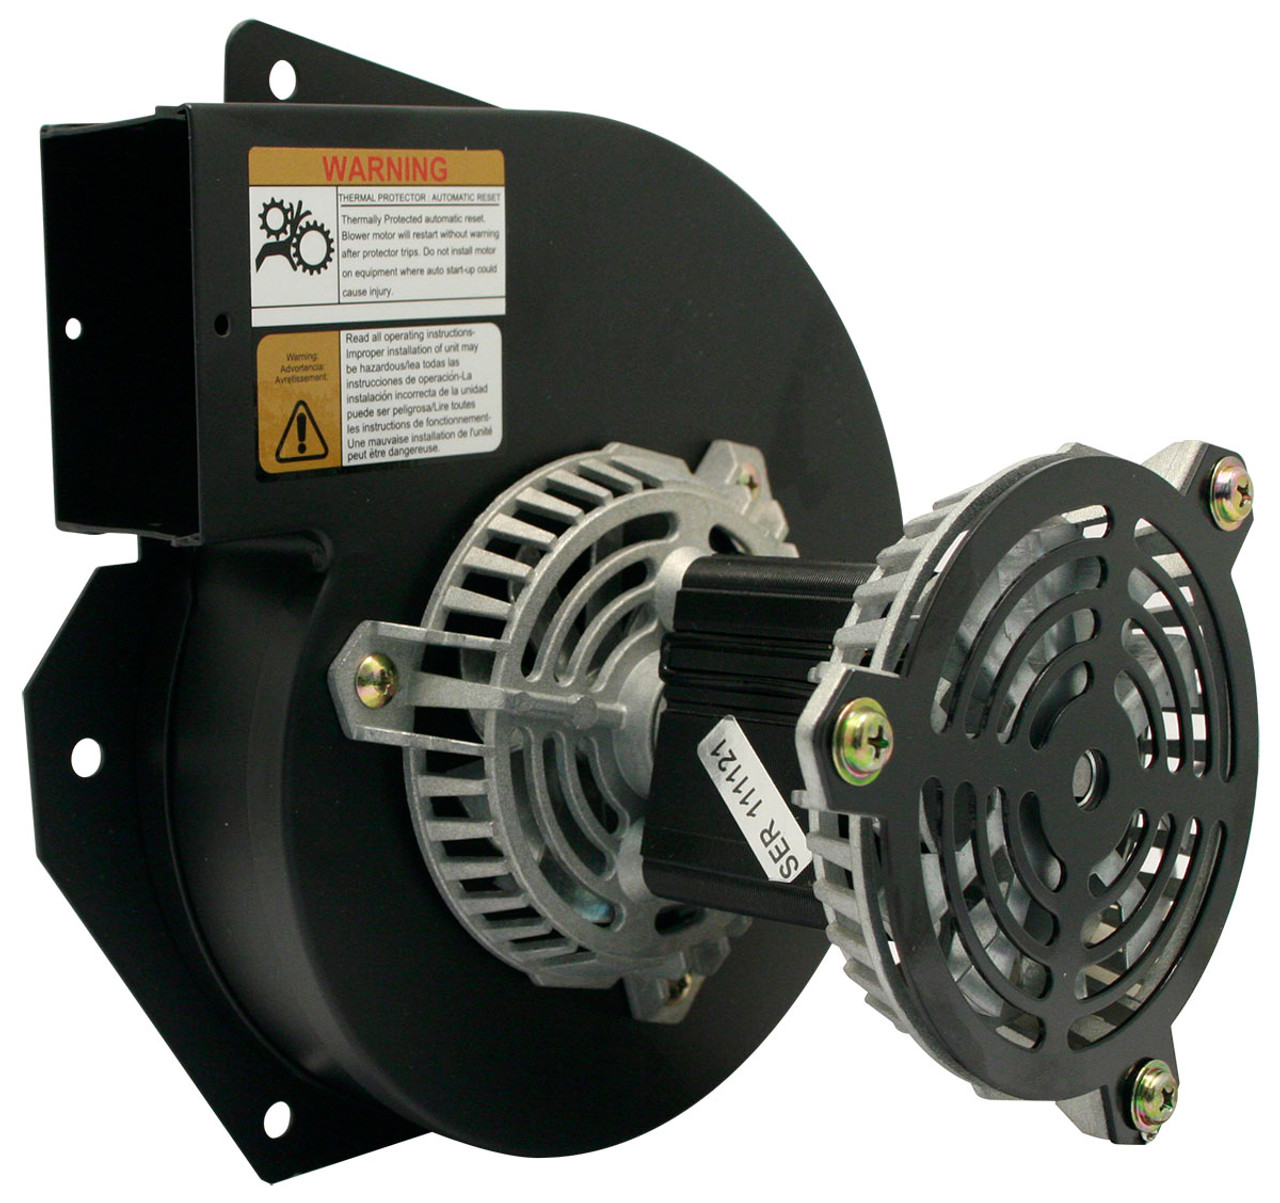 trane furnace draft inducer blower 7002 2558 d330787p01 blw473 rotom fb rfb337 [ 1200 x 1128 Pixel ]